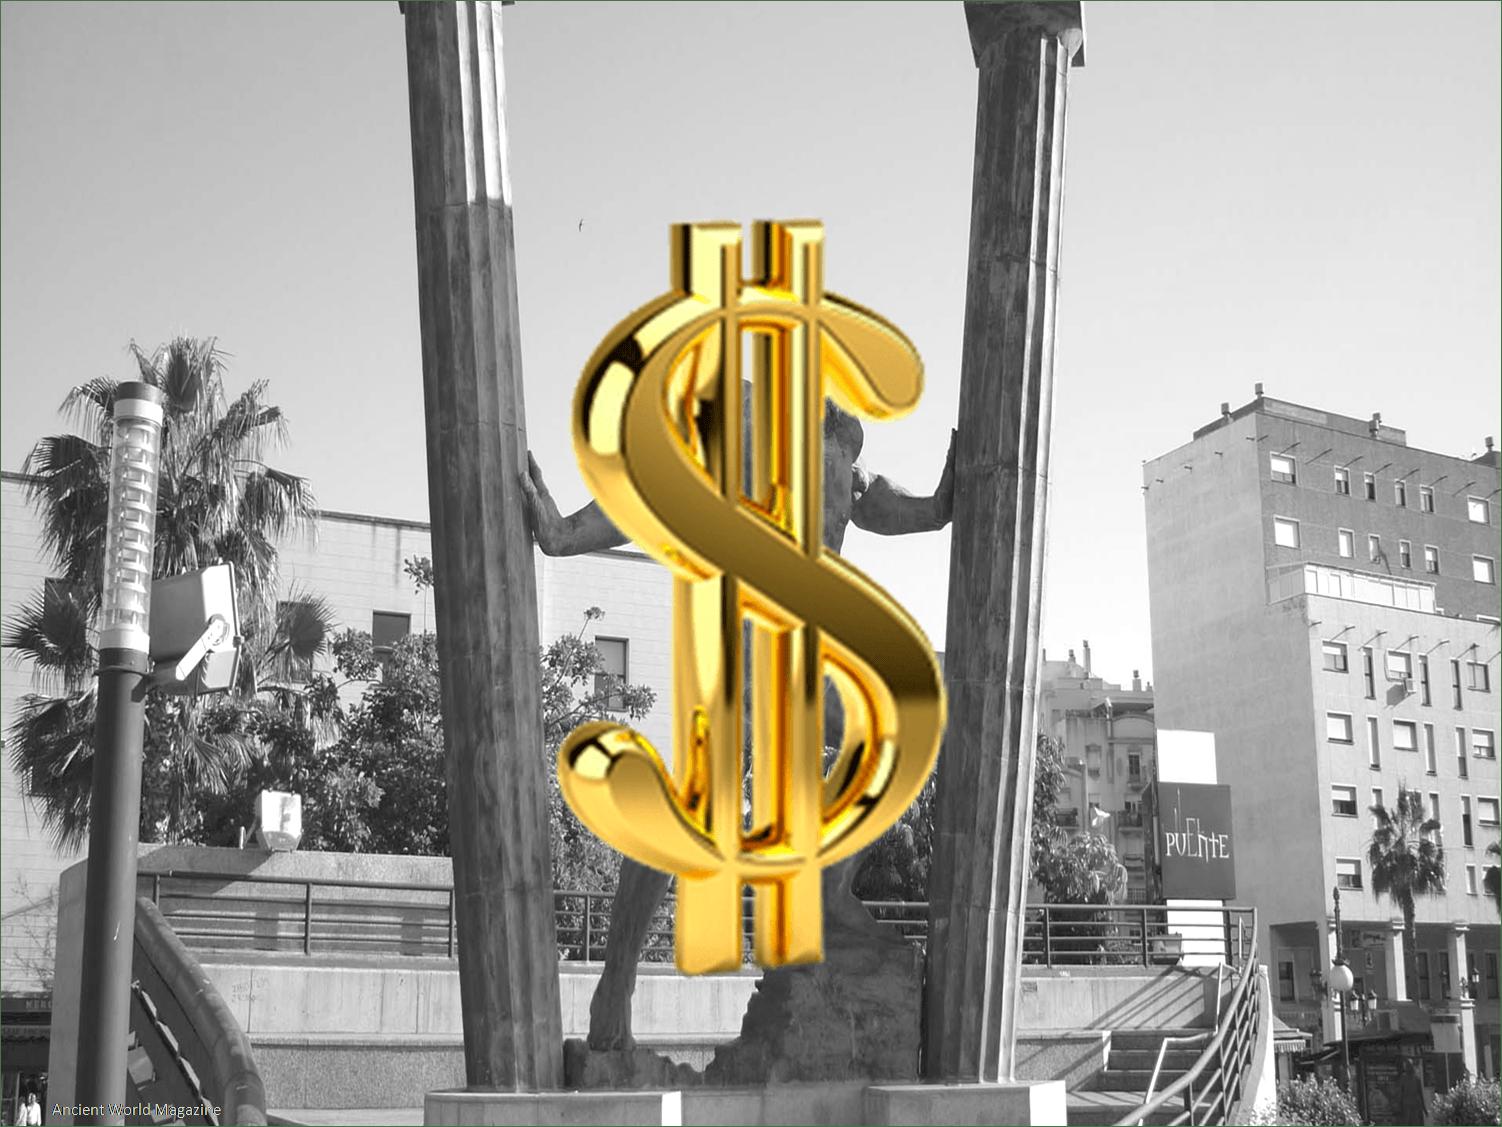 columnas-hercules-dolar-españa-plus-ultra-estados-unidos-simbolos-simbologia